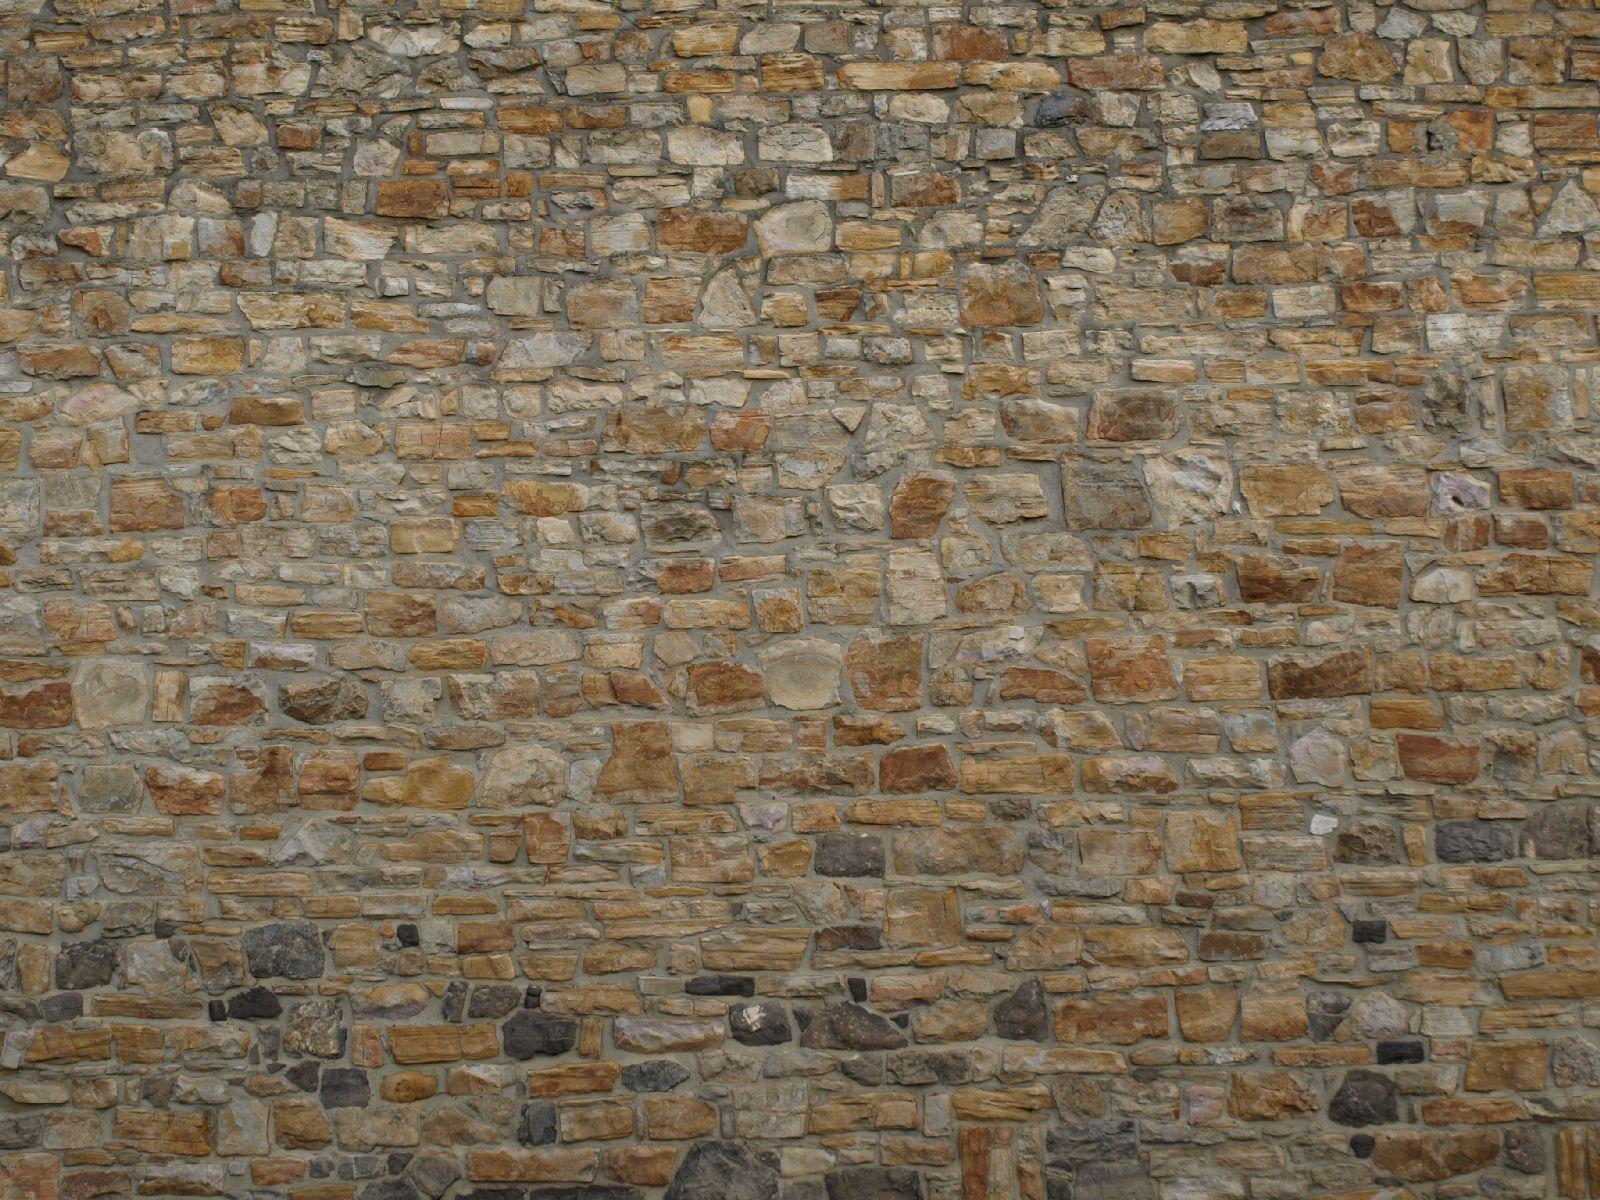 Brick_Texture_A_PA045753